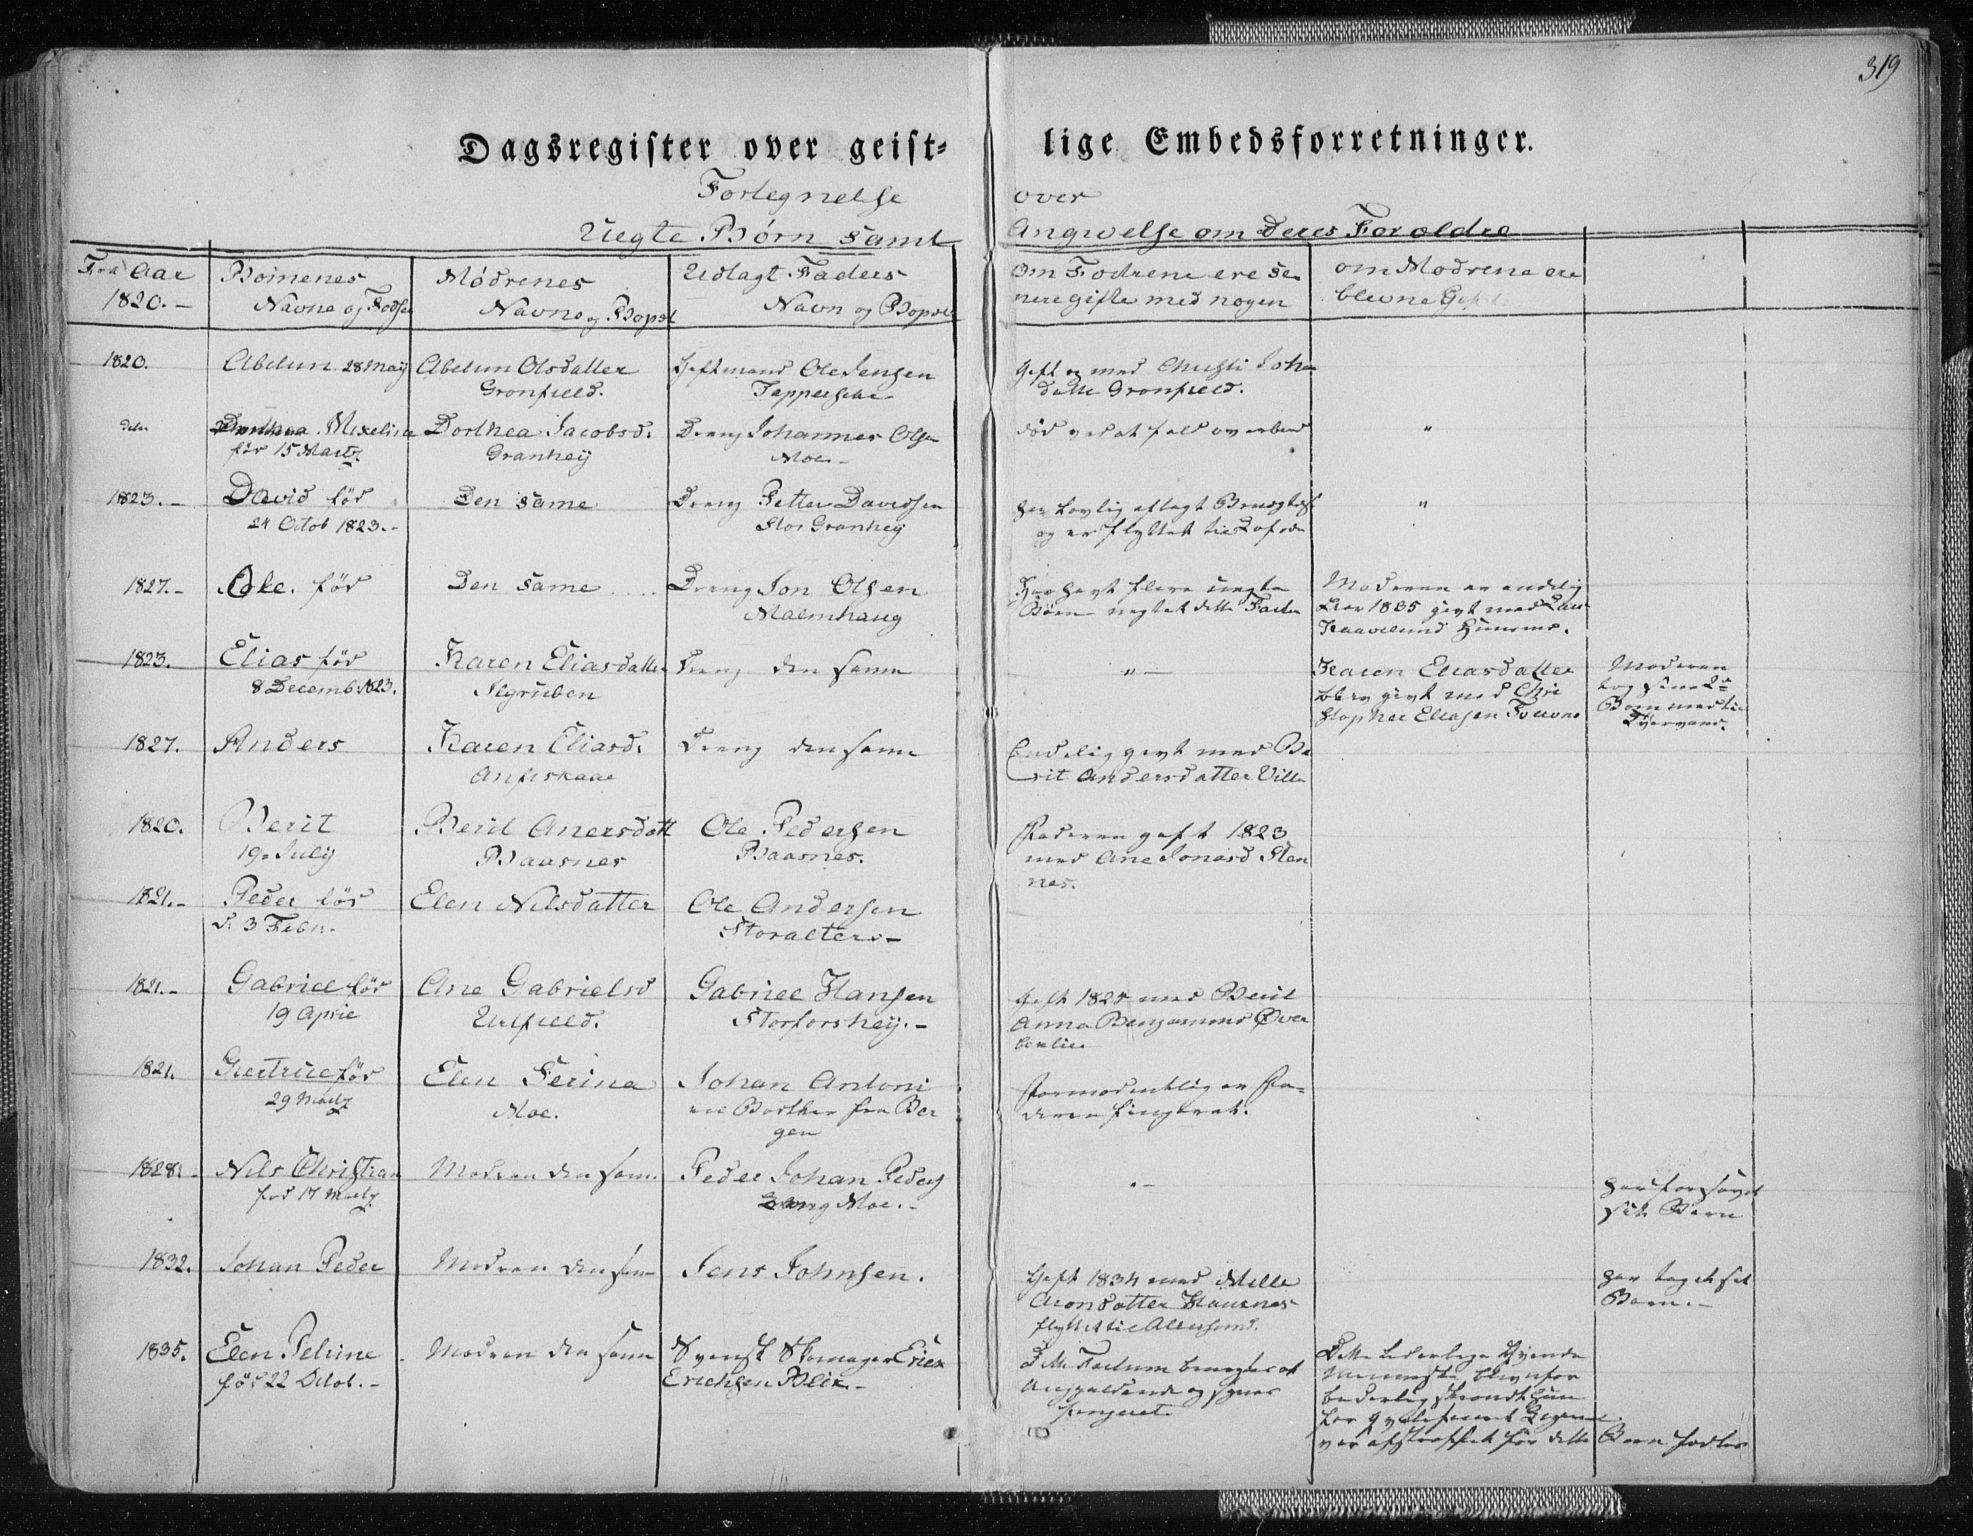 SAT, Ministerialprotokoller, klokkerbøker og fødselsregistre - Nordland, 827/L0390: Ministerialbok nr. 827A02, 1826-1841, s. 319